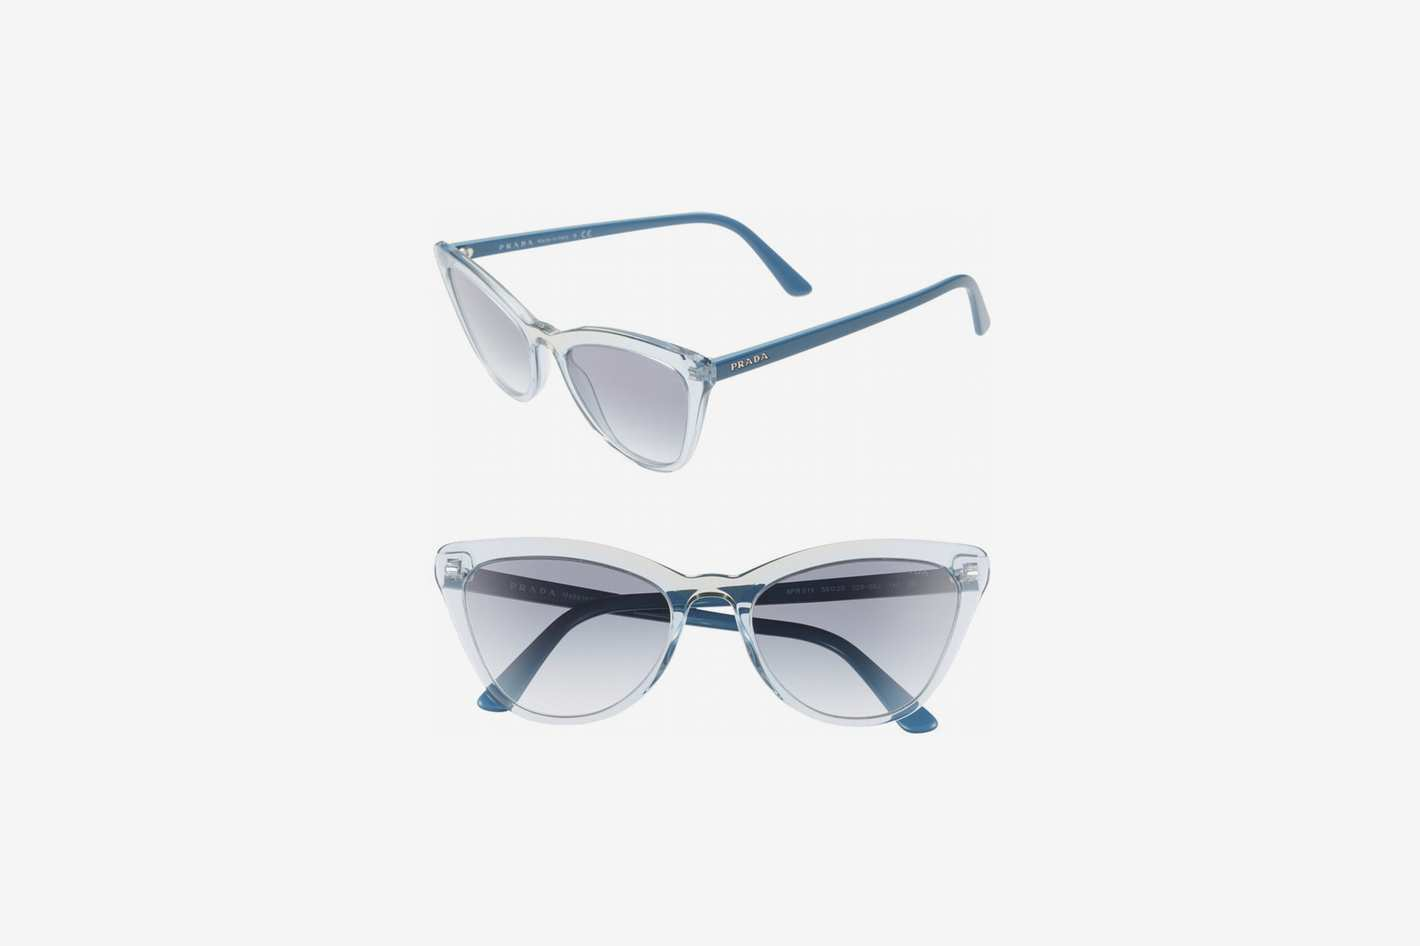 Prada 56mm Cat-Eye Sunglasses